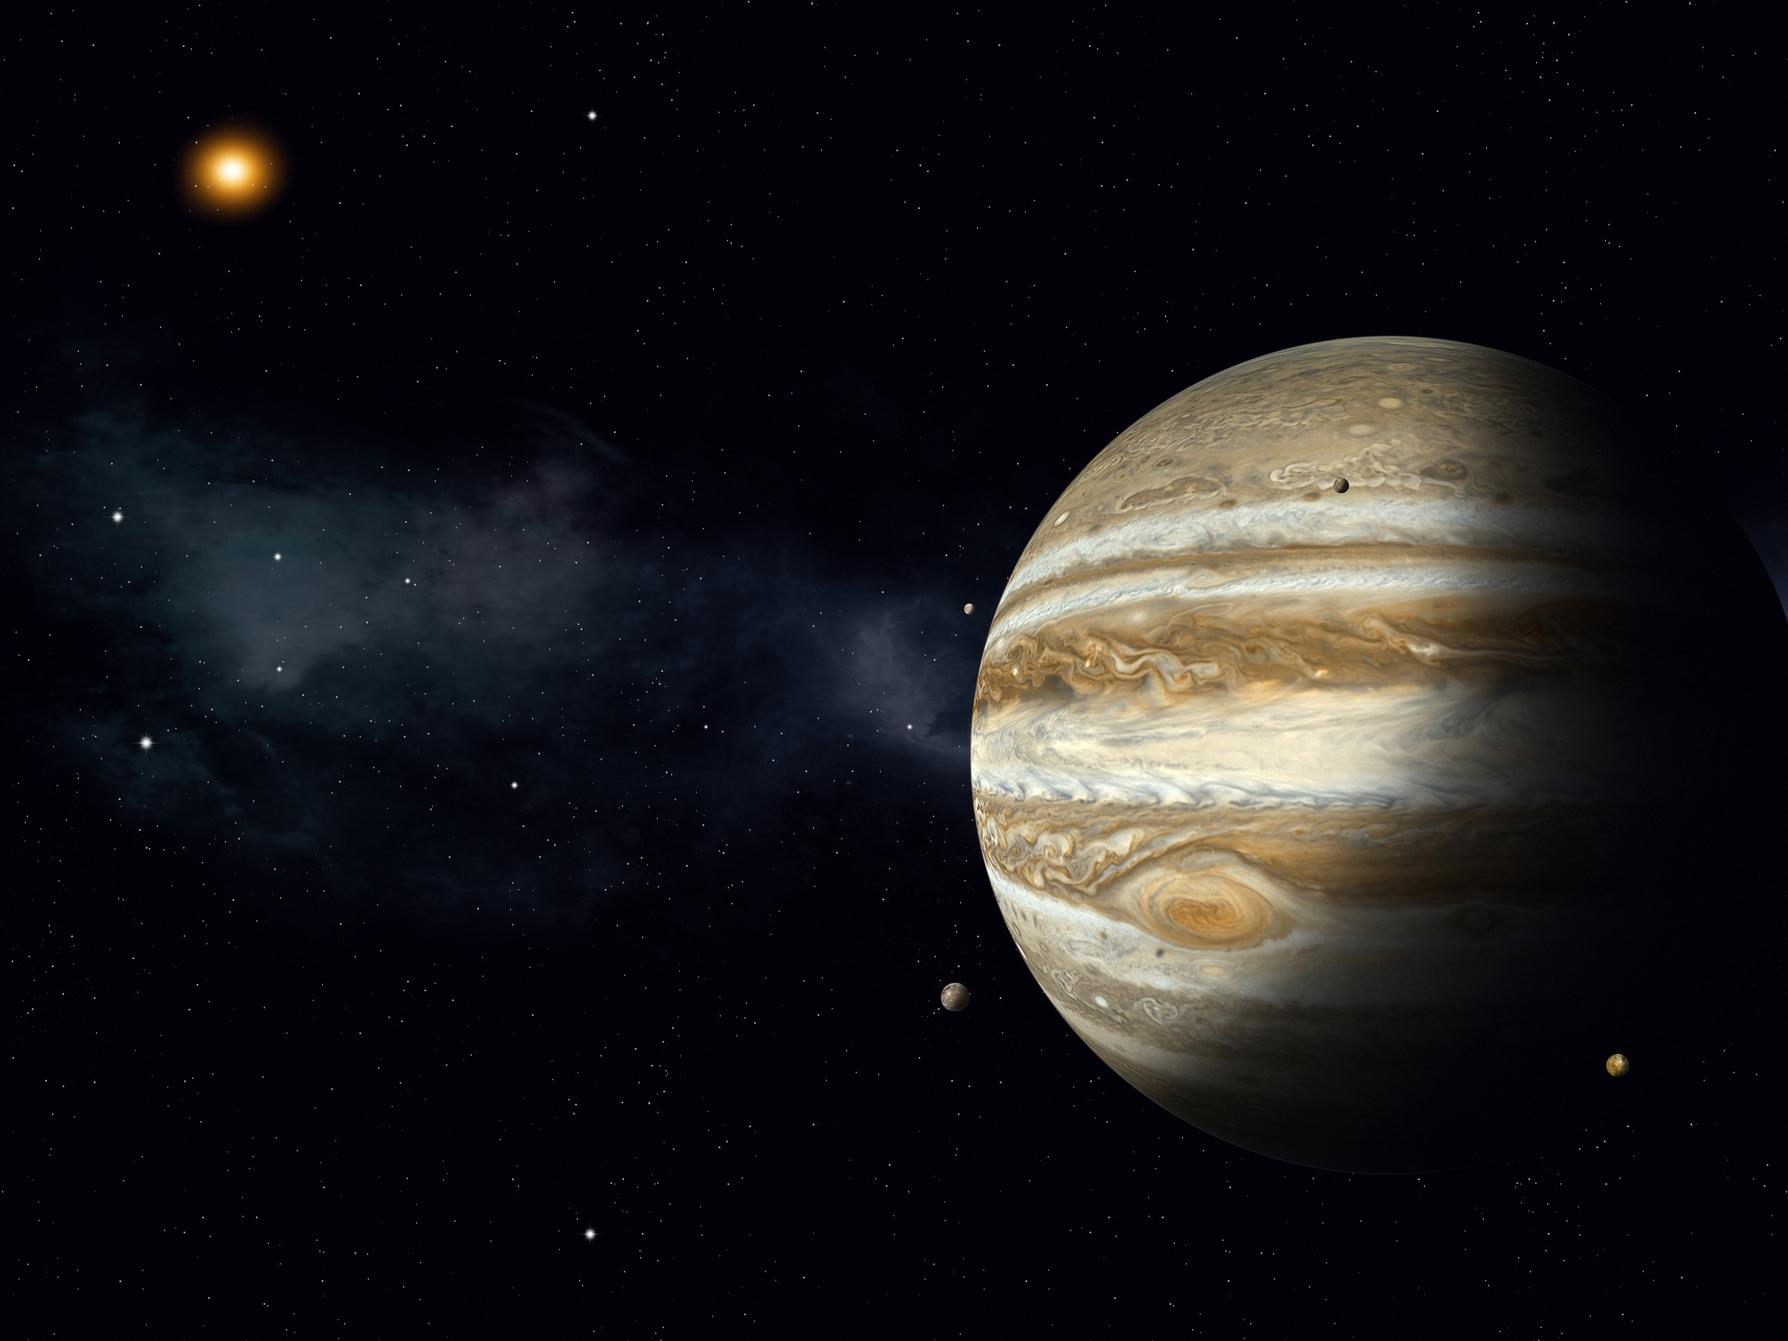 Something strange is happening to Jupiters Great Red Spot